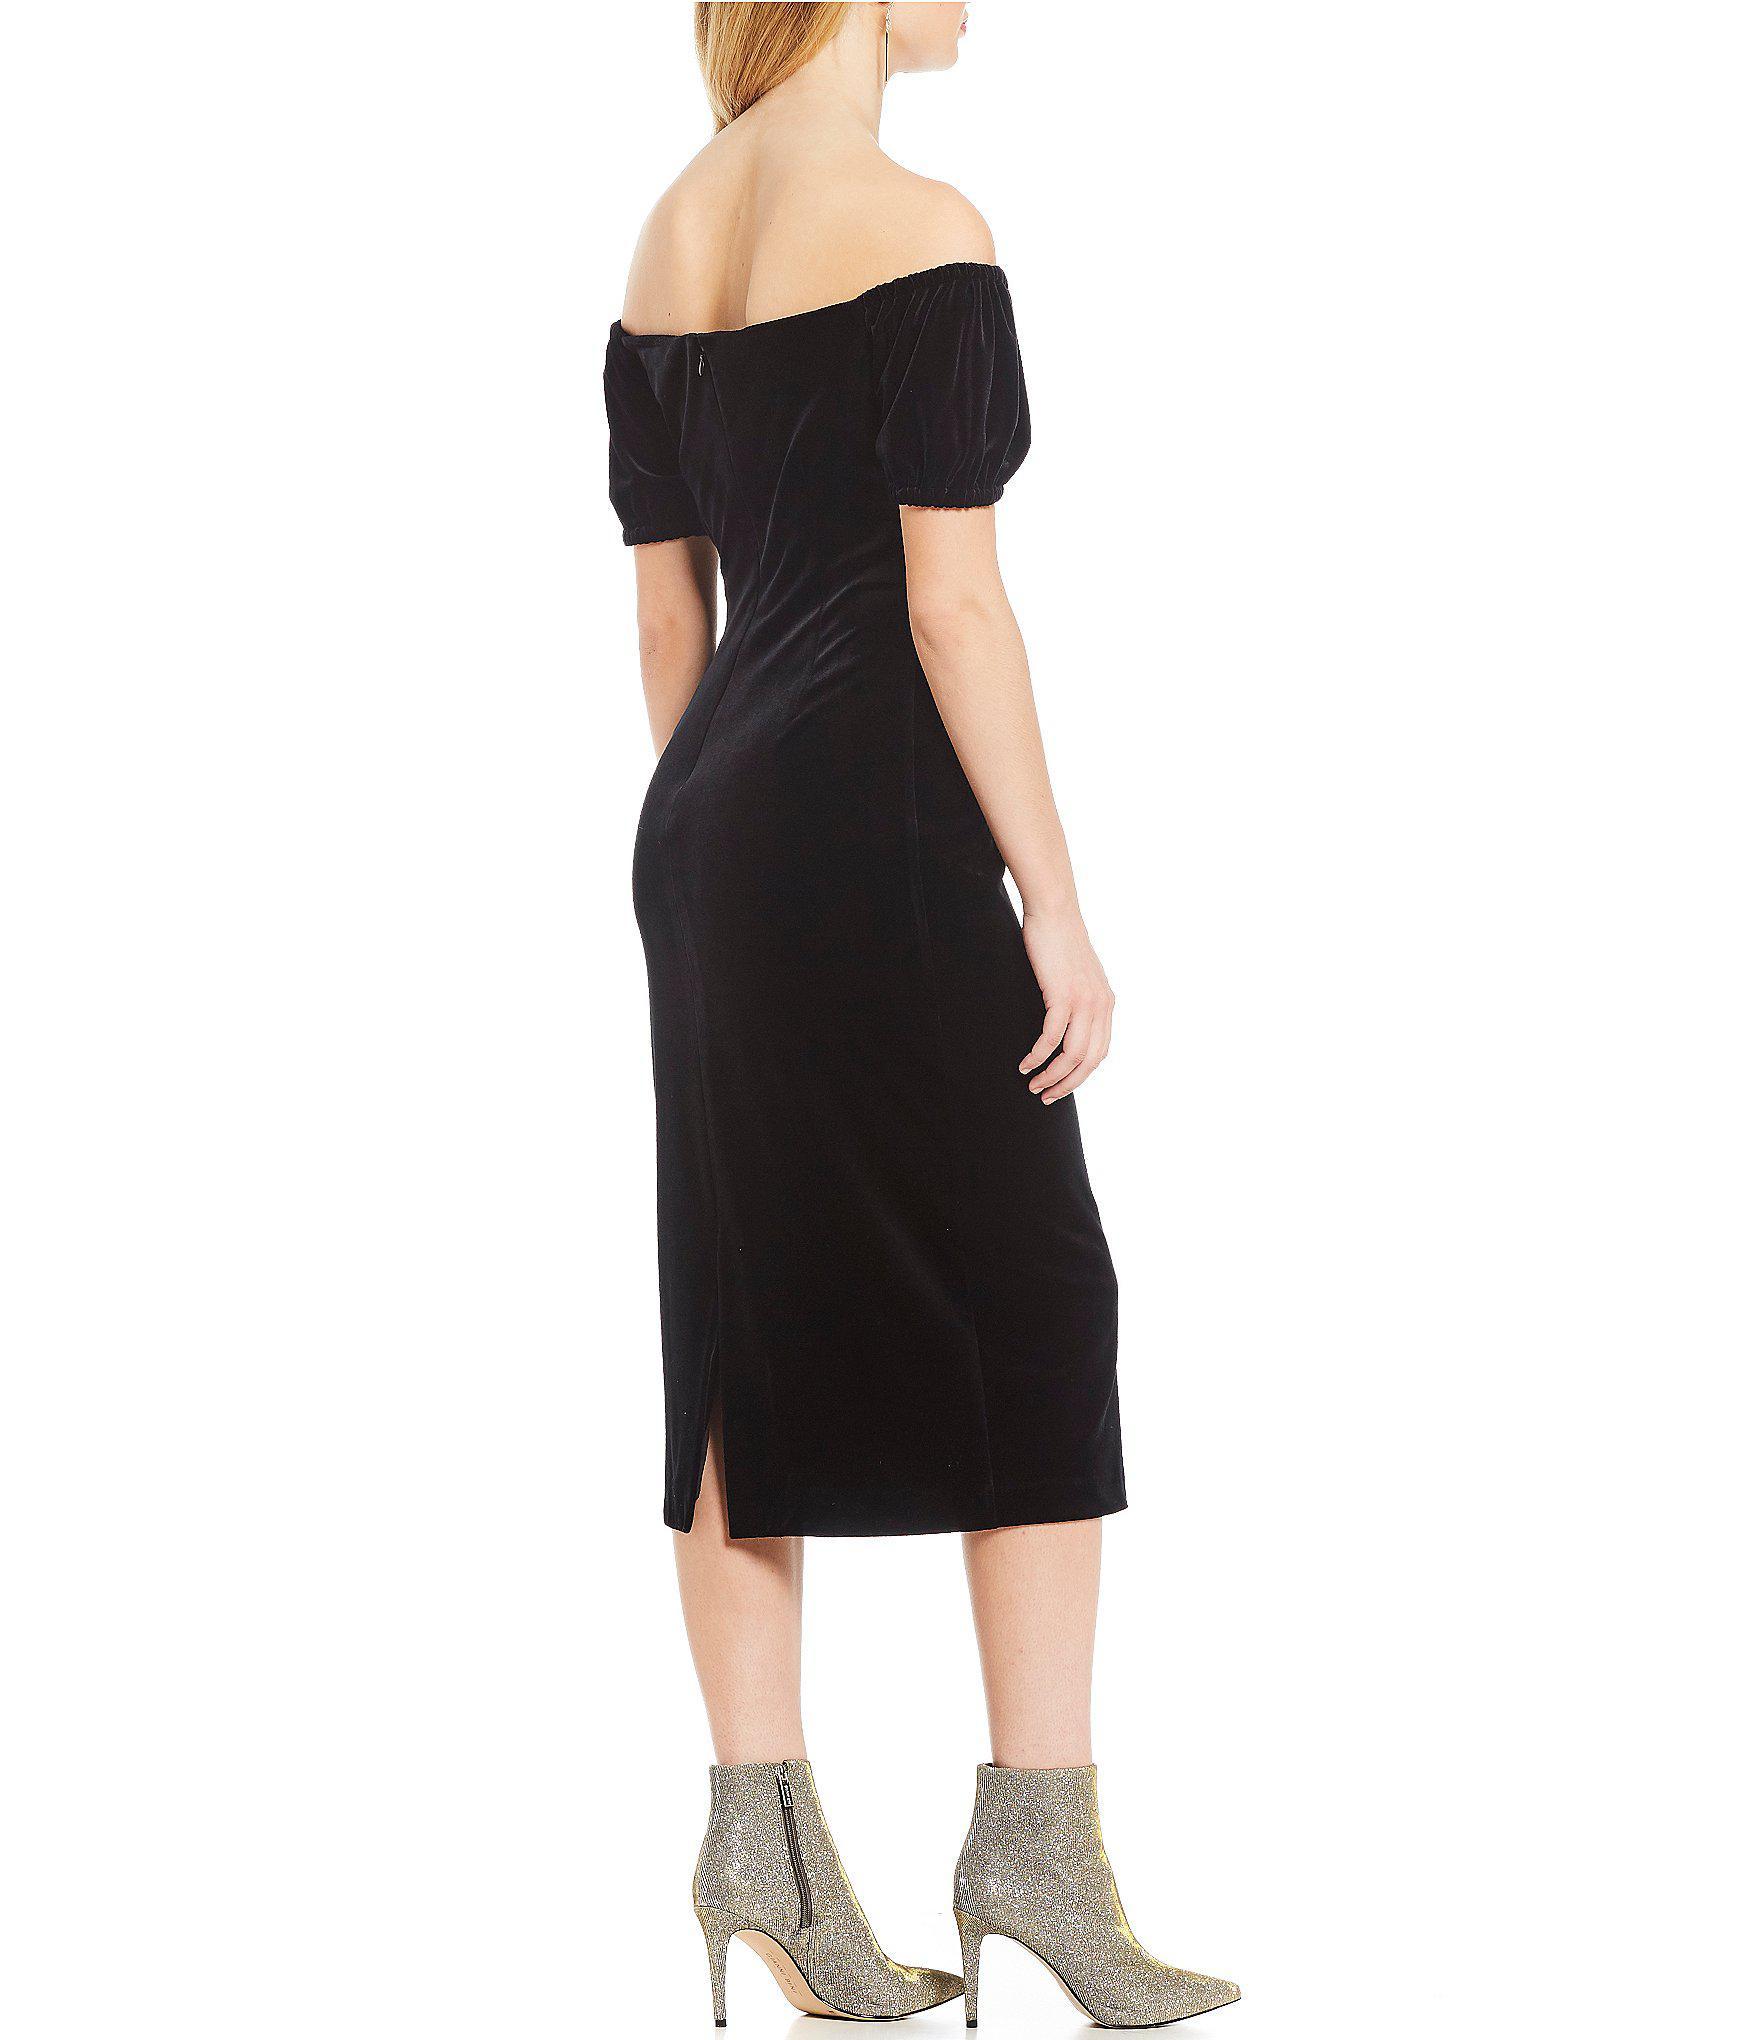 16d39e71f43 Gianni Bini - Black Stefi Off-the-shoulder Velvet Midi Length Sheath Dress  -. View fullscreen